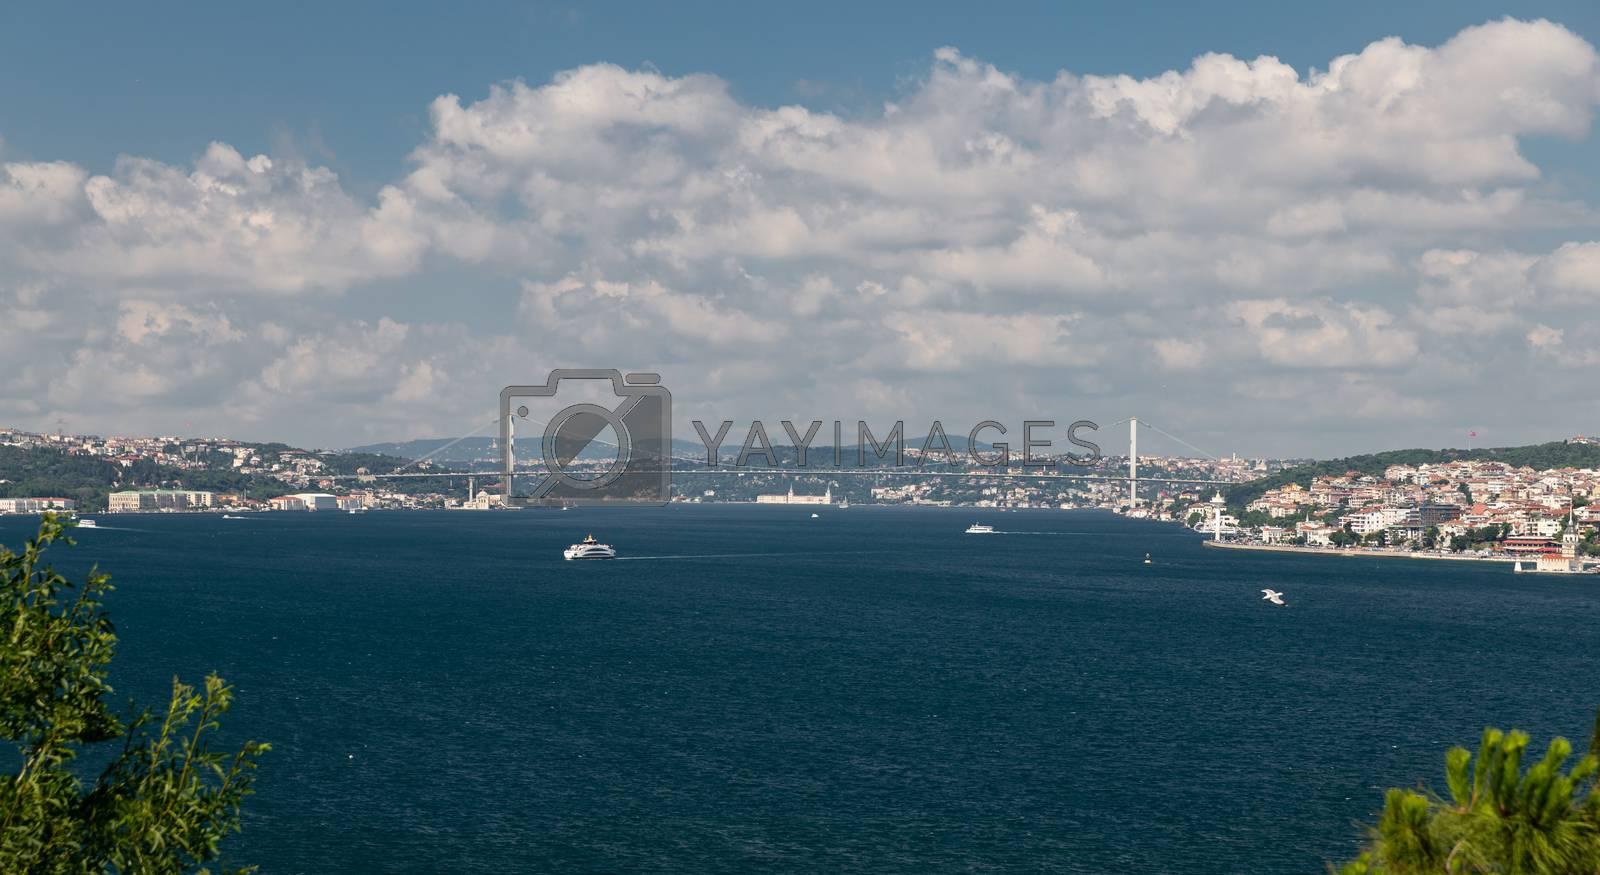 Bosphorus Strait and Bosphorus Bridge in Istanbul City, Turkey